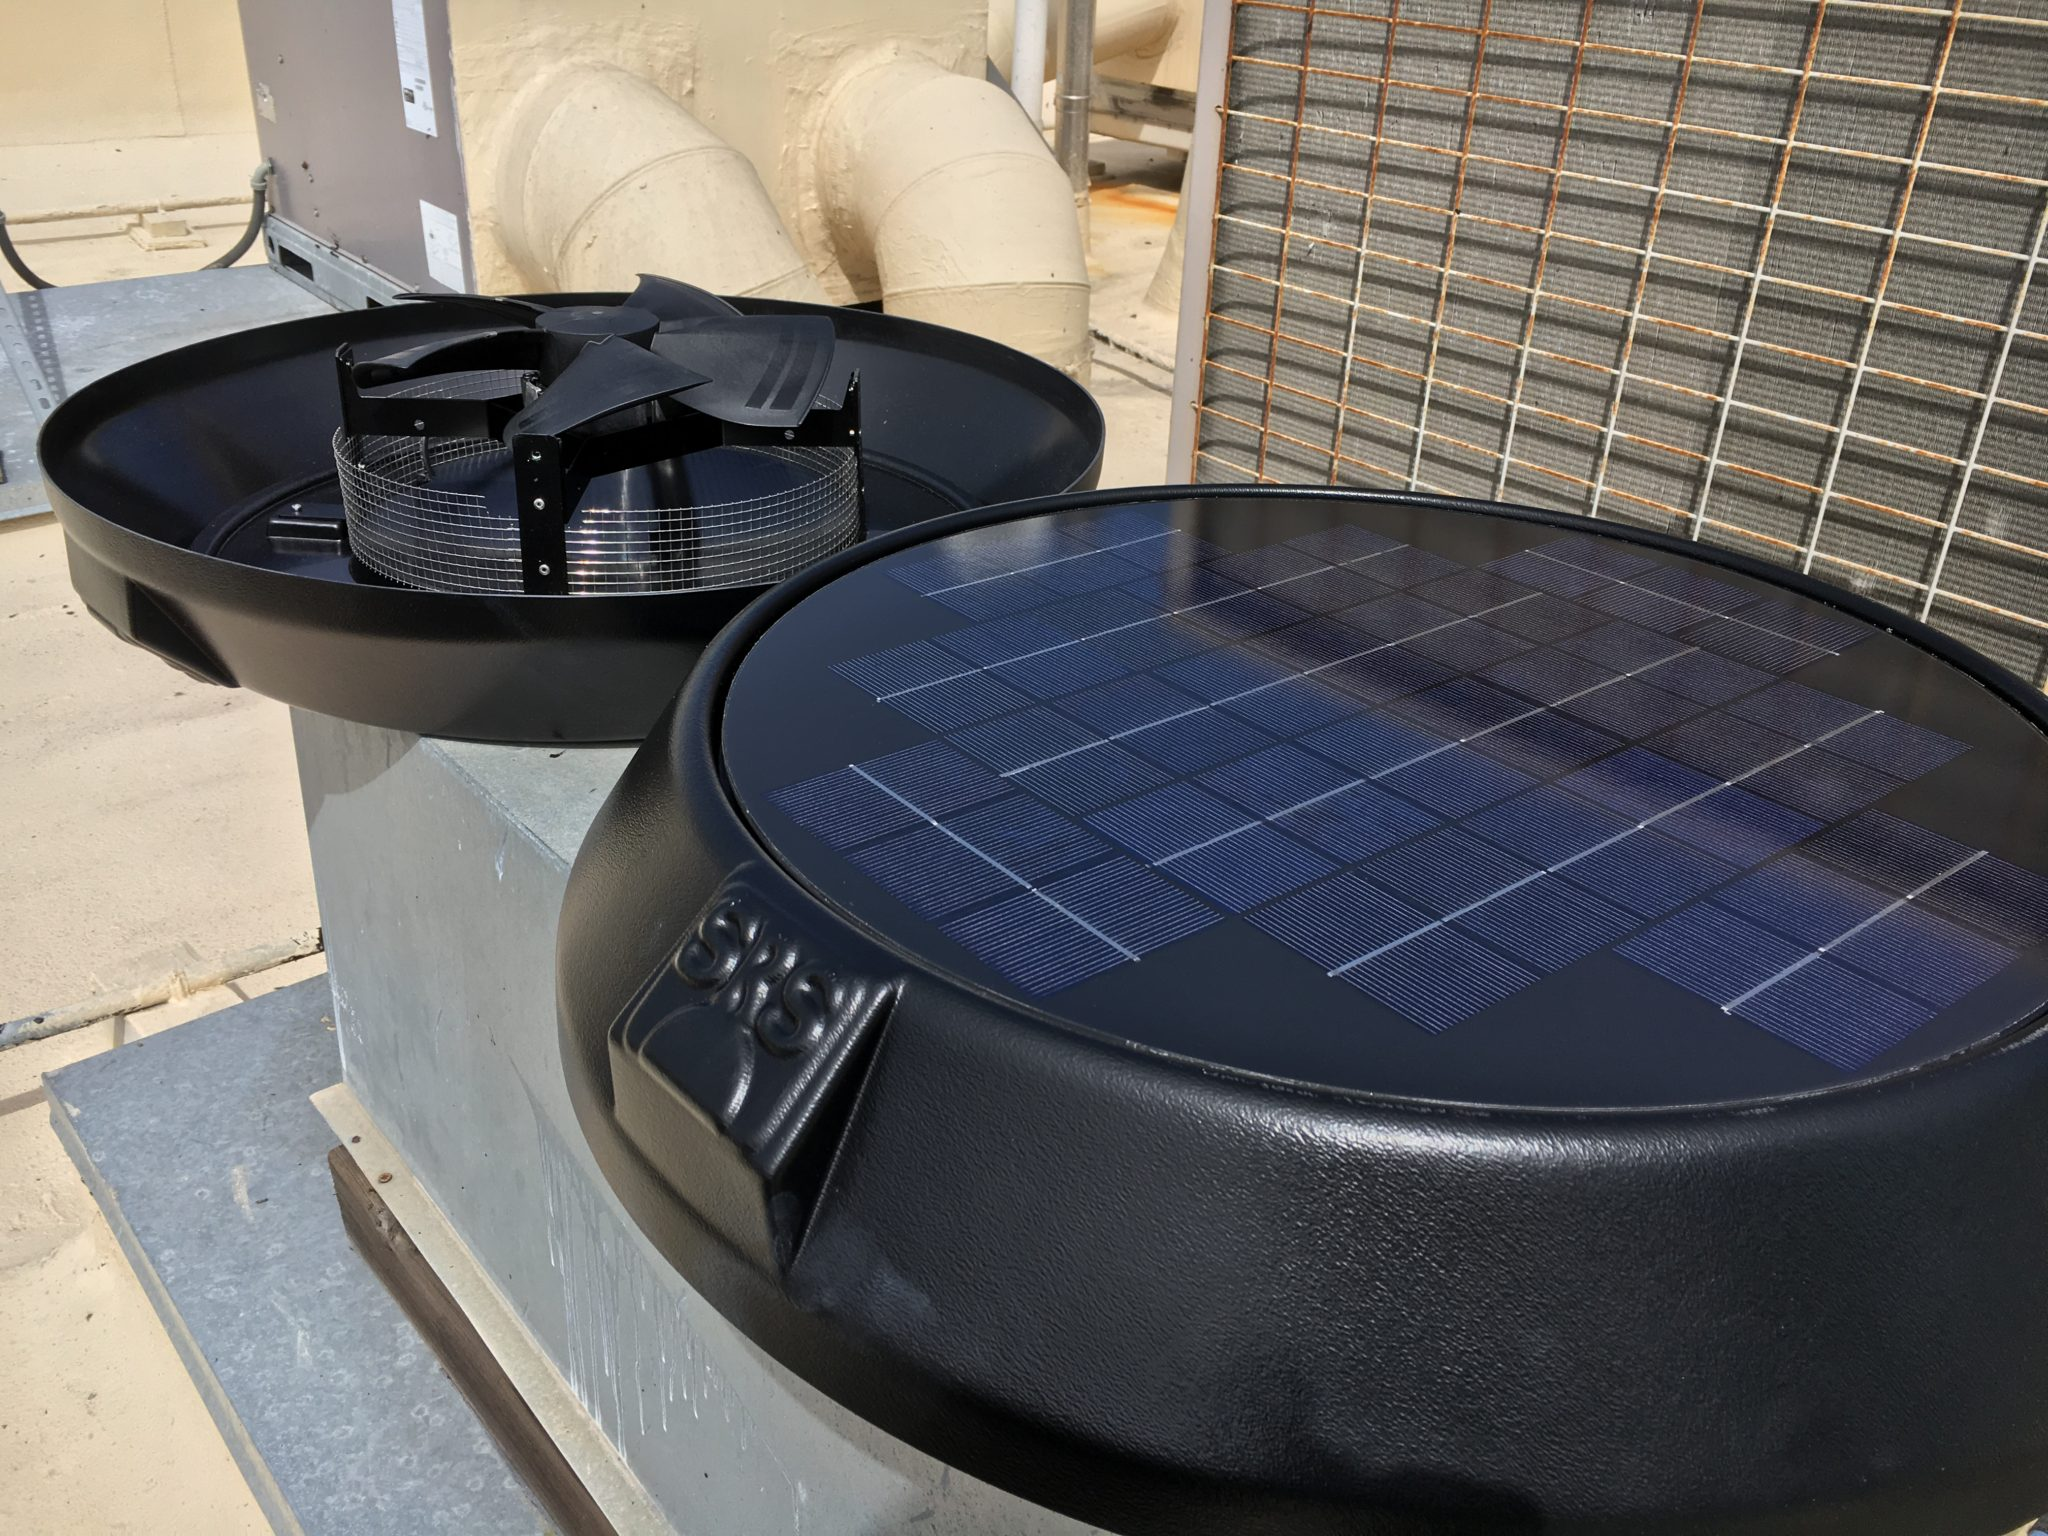 Solar star attic fan complaints - Quality American Made Solar Attic Fans